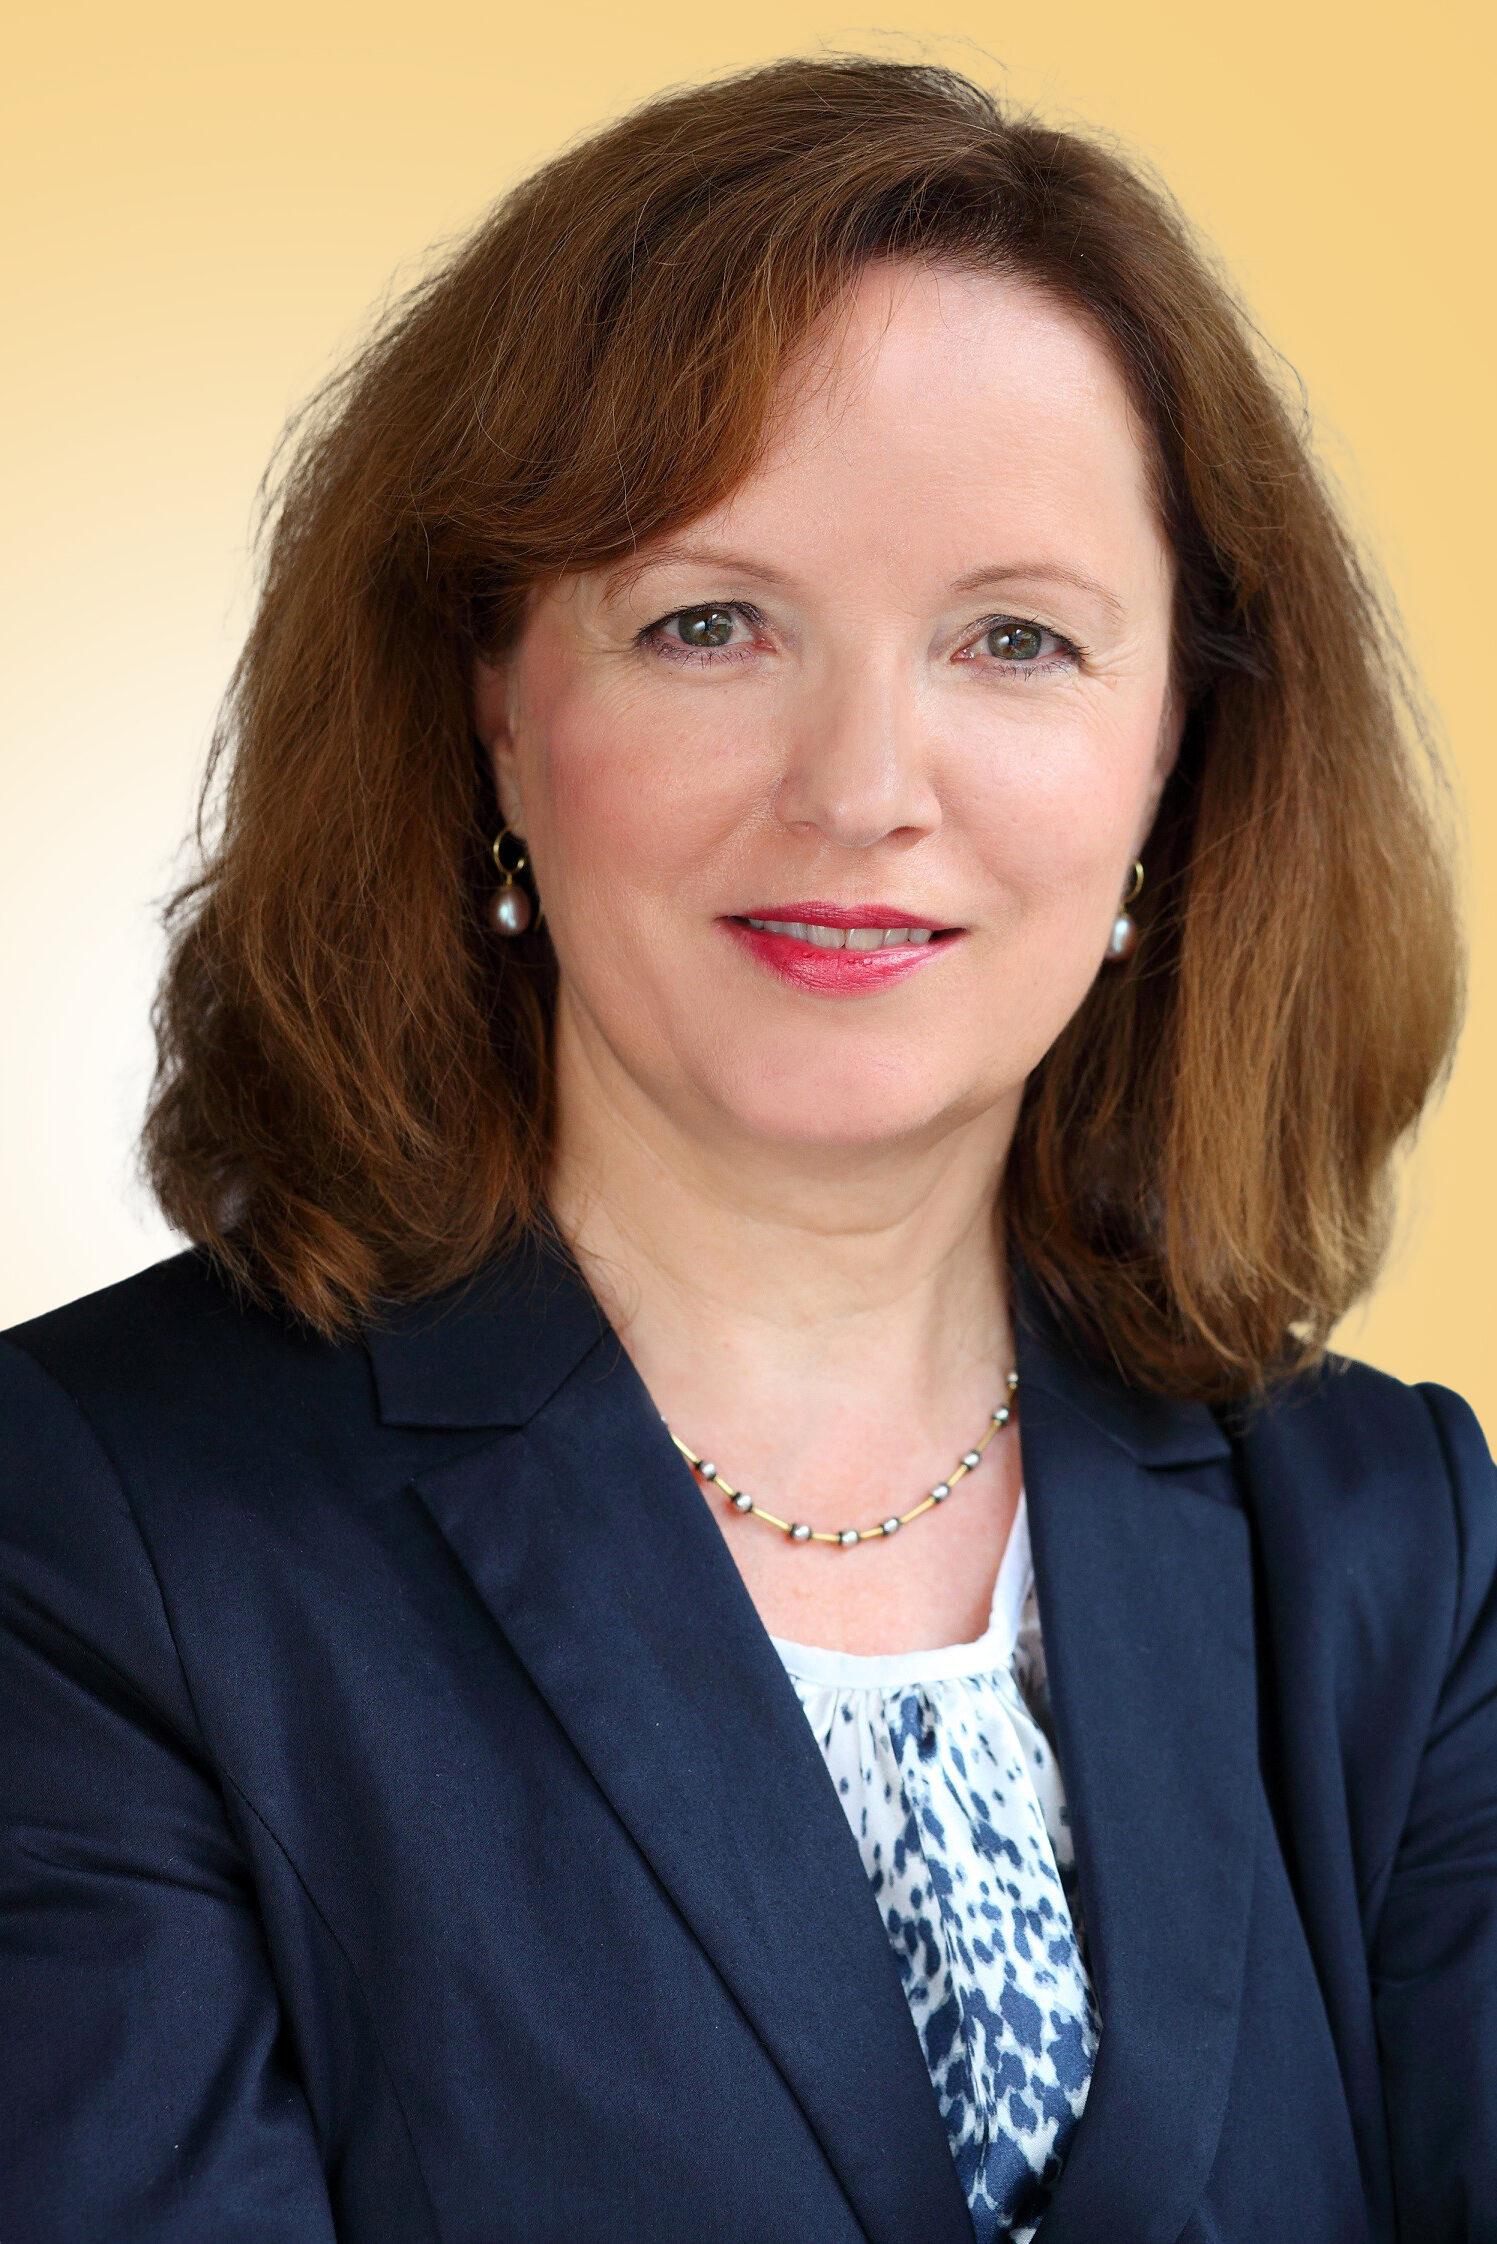 Sabine Hekmat